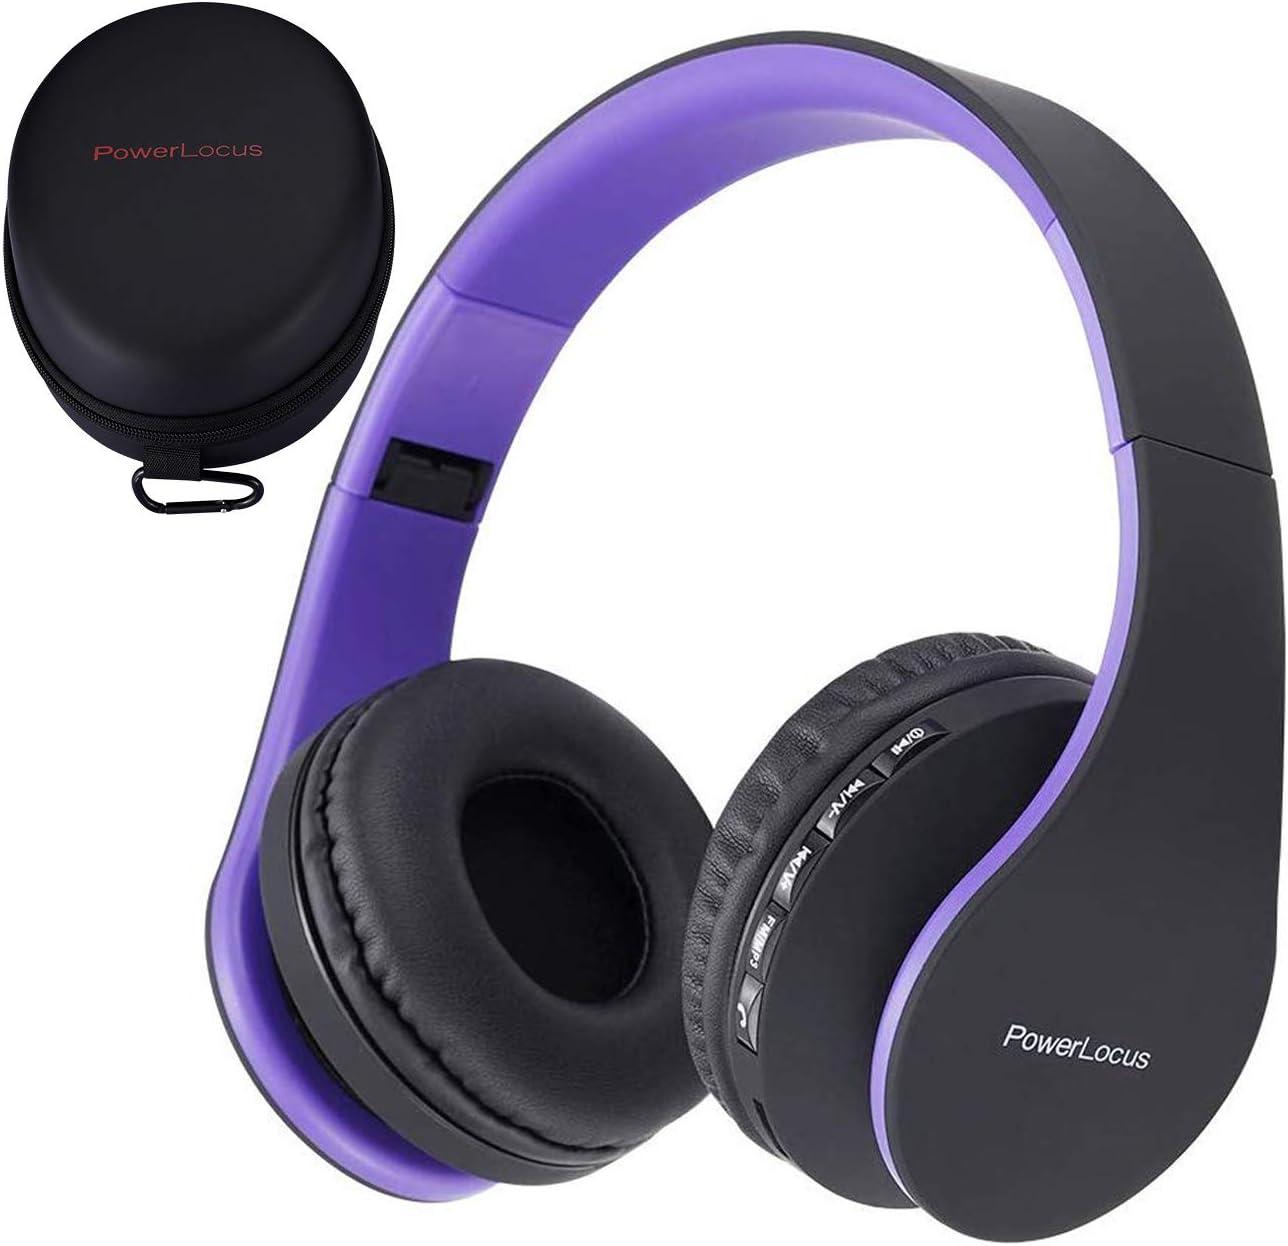 PowerLocus P1 – Auriculares Bluetooth inalambricos de Diadema Cascos Plegables, Casco Bluetooth con Sonido Estéreo con Conexión a Bluetooth Inalámbrico y Audio Cable para Movil, PC, Tablet (Morado)